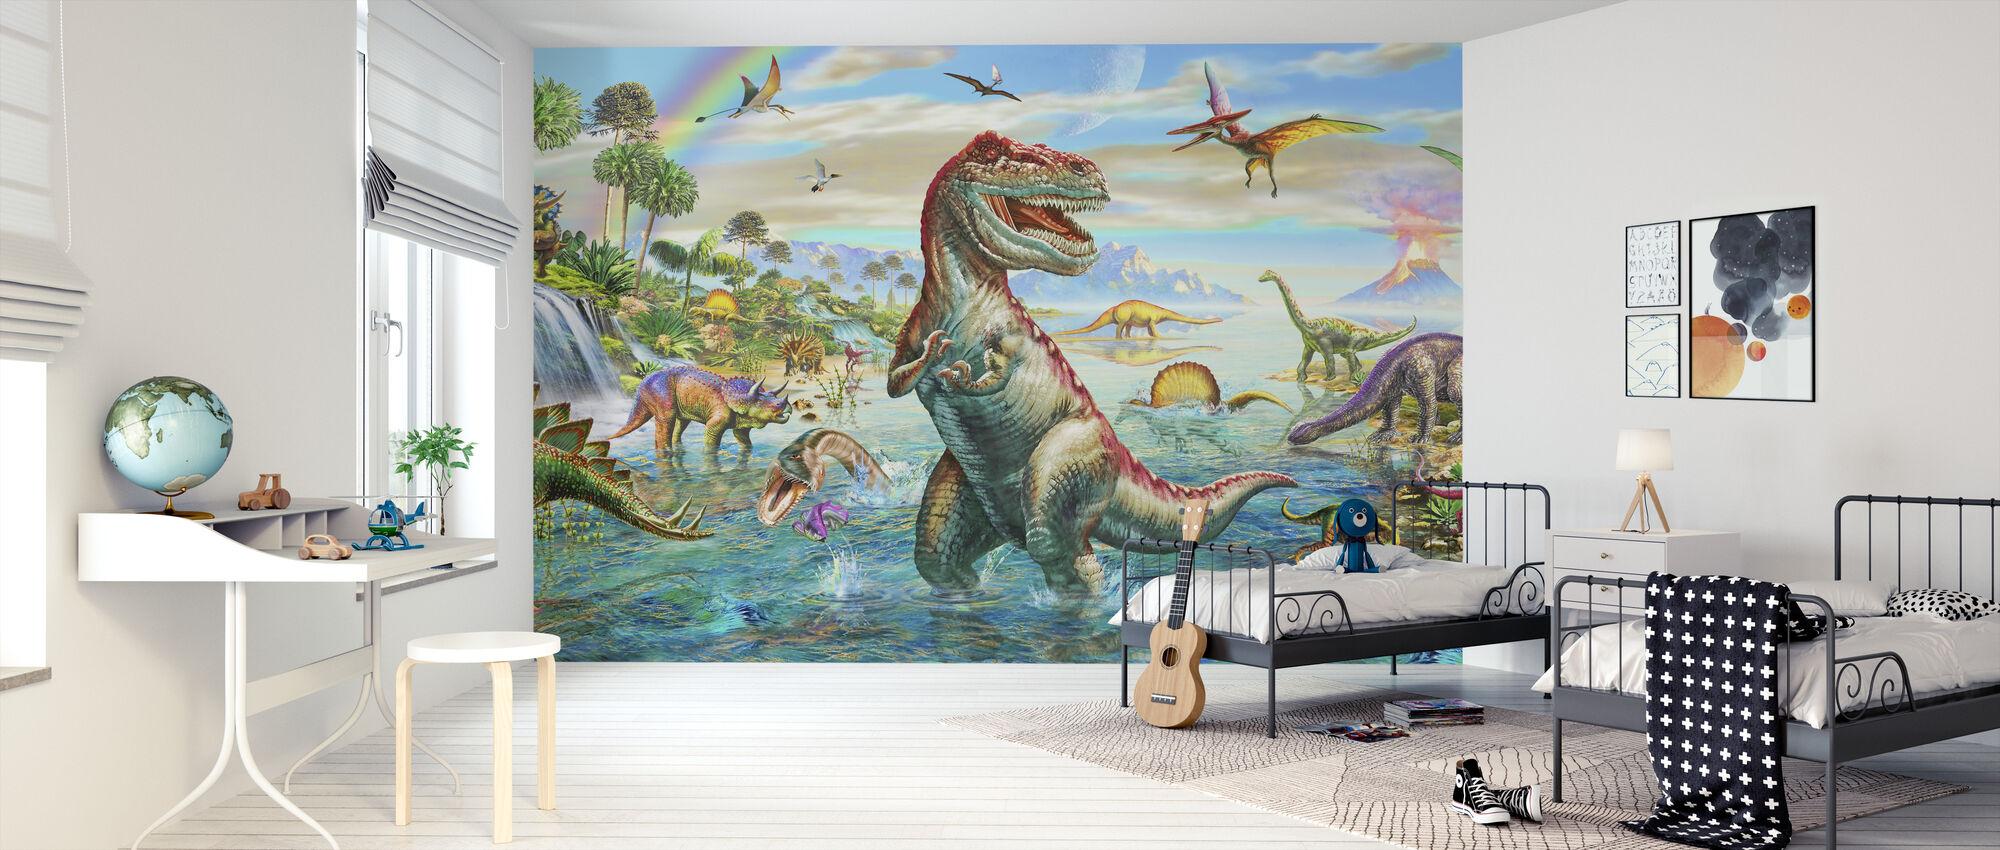 Prehistoric Panorama - Wallpaper - Kids Room